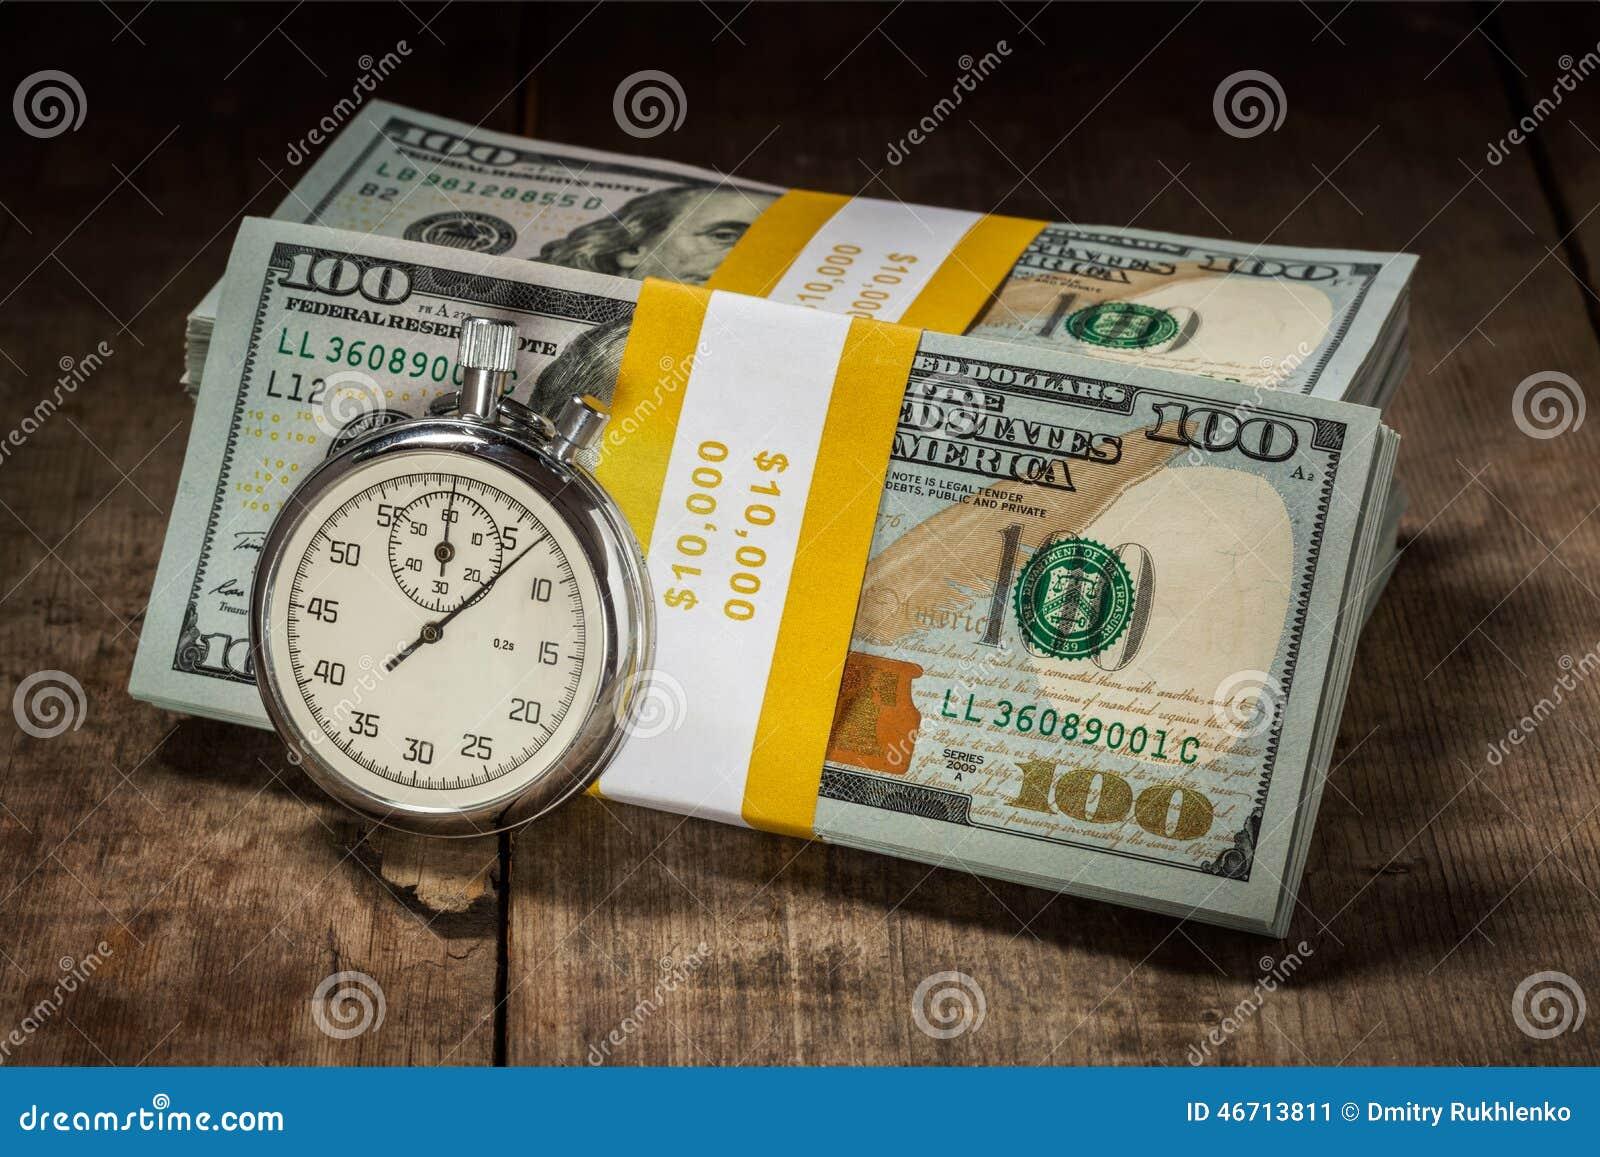 loan dollars